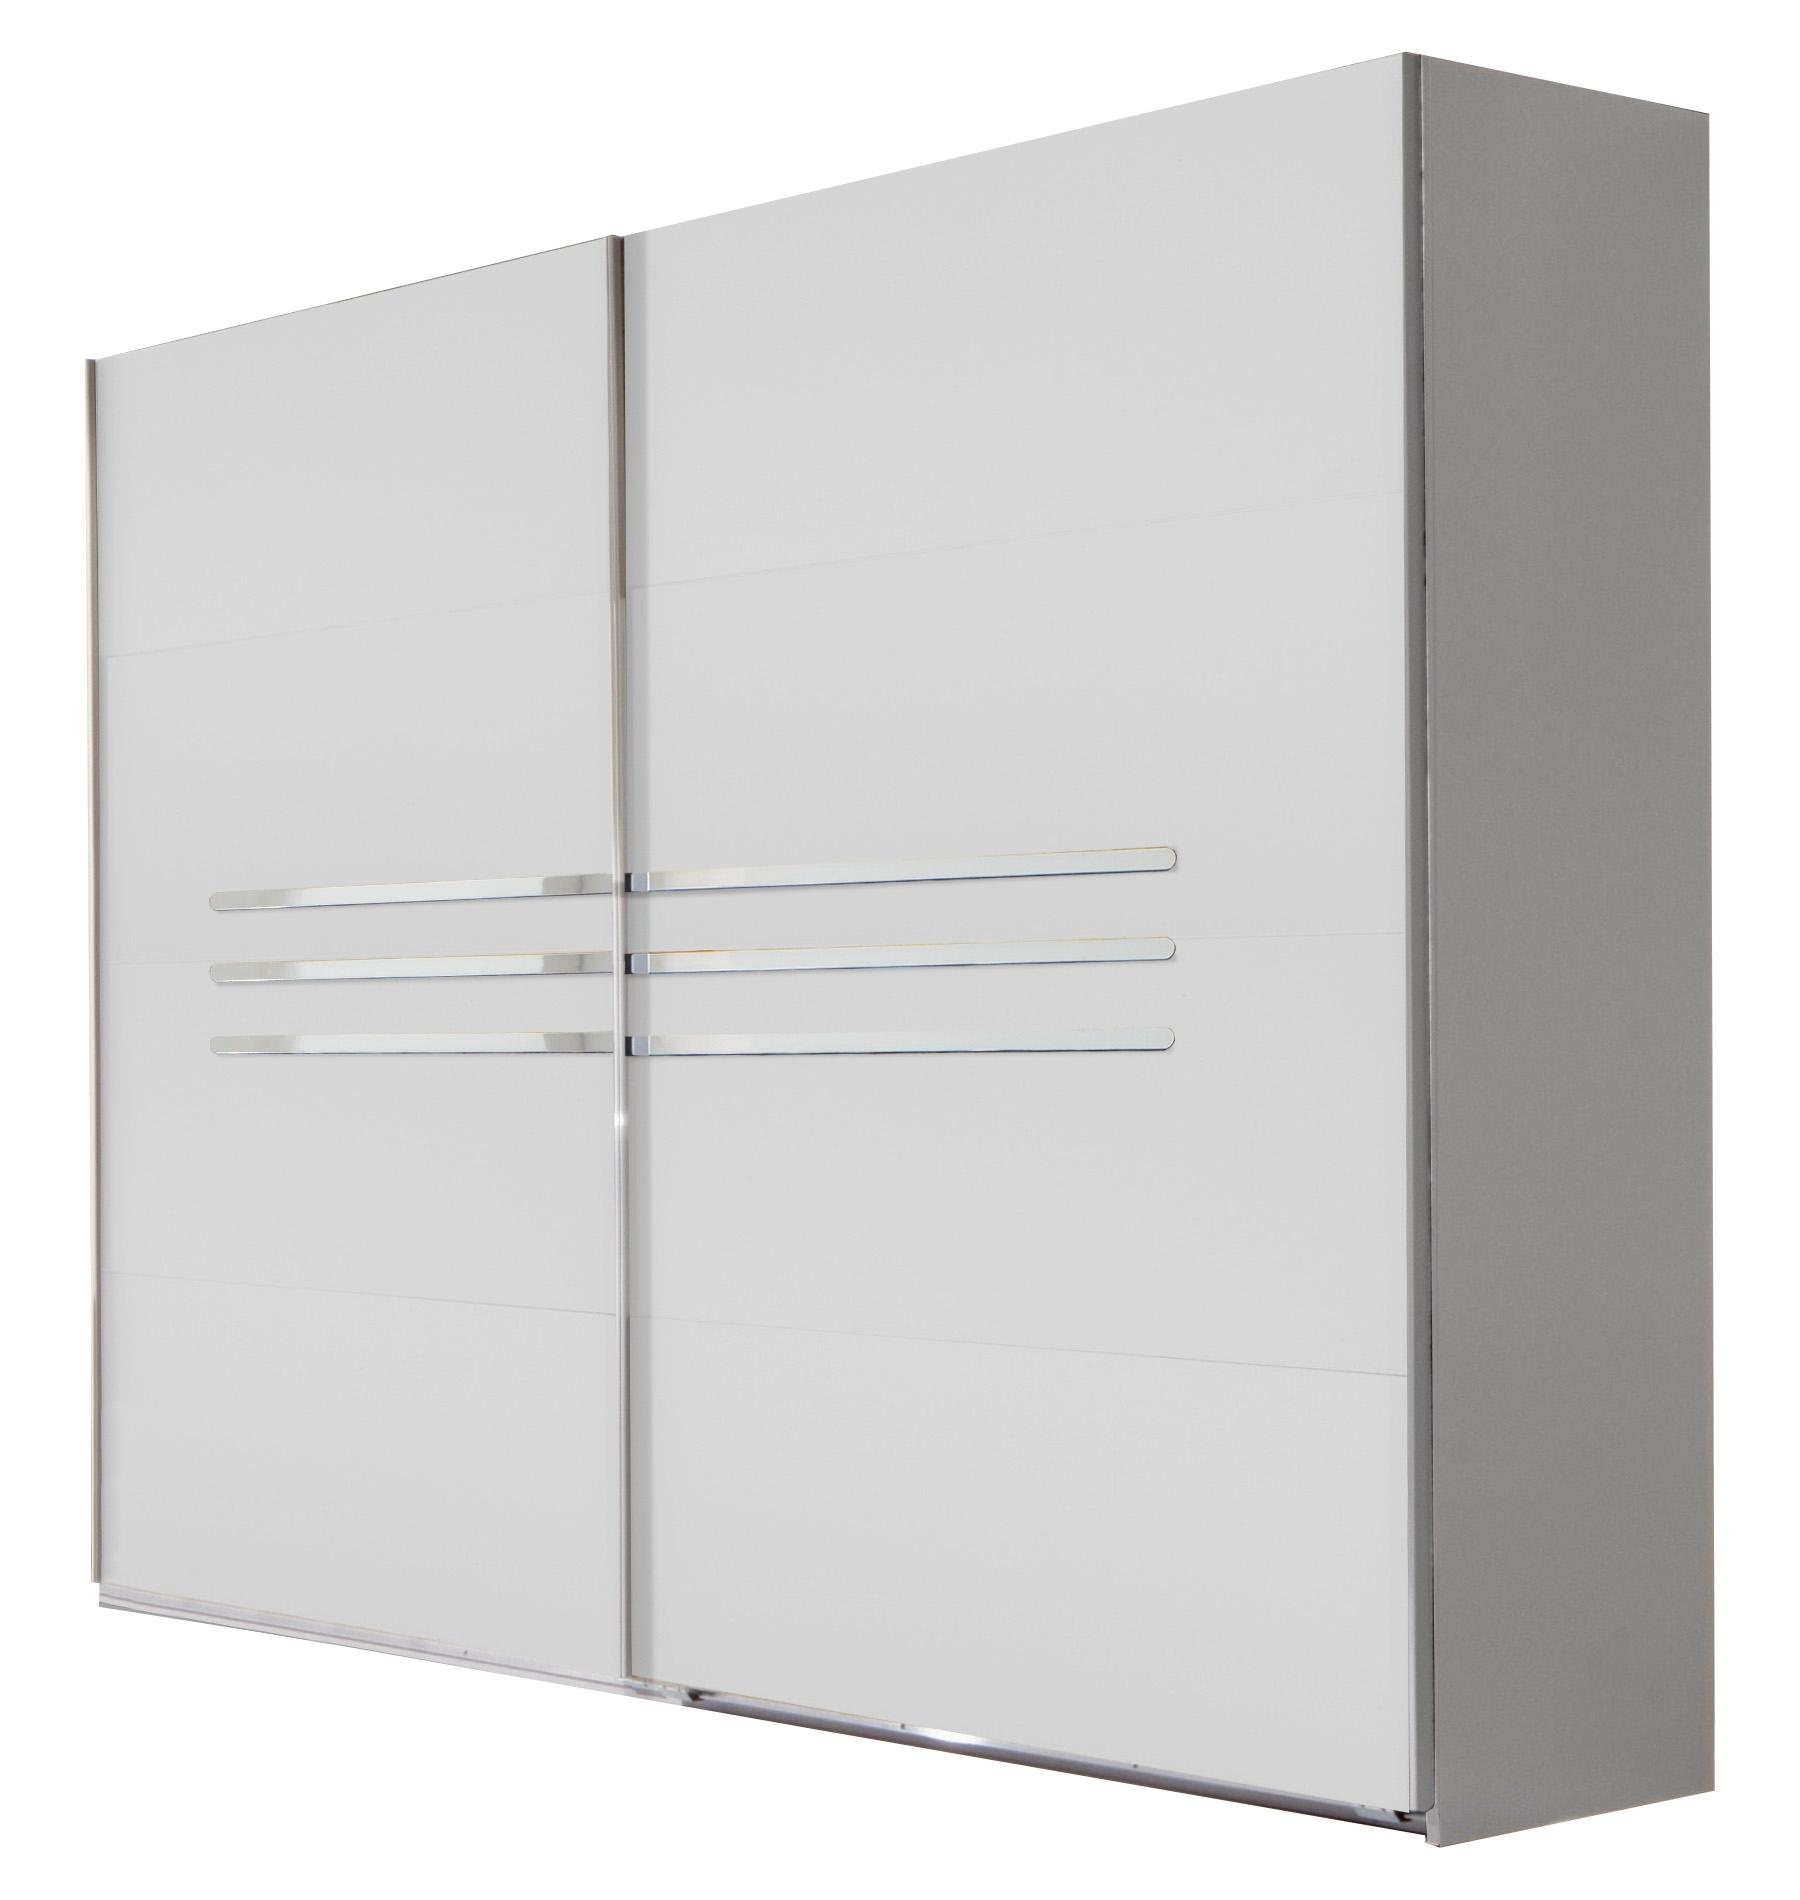 Armoire design portes coulissantes 225 cm blanc alpin/chrome brillant Bella